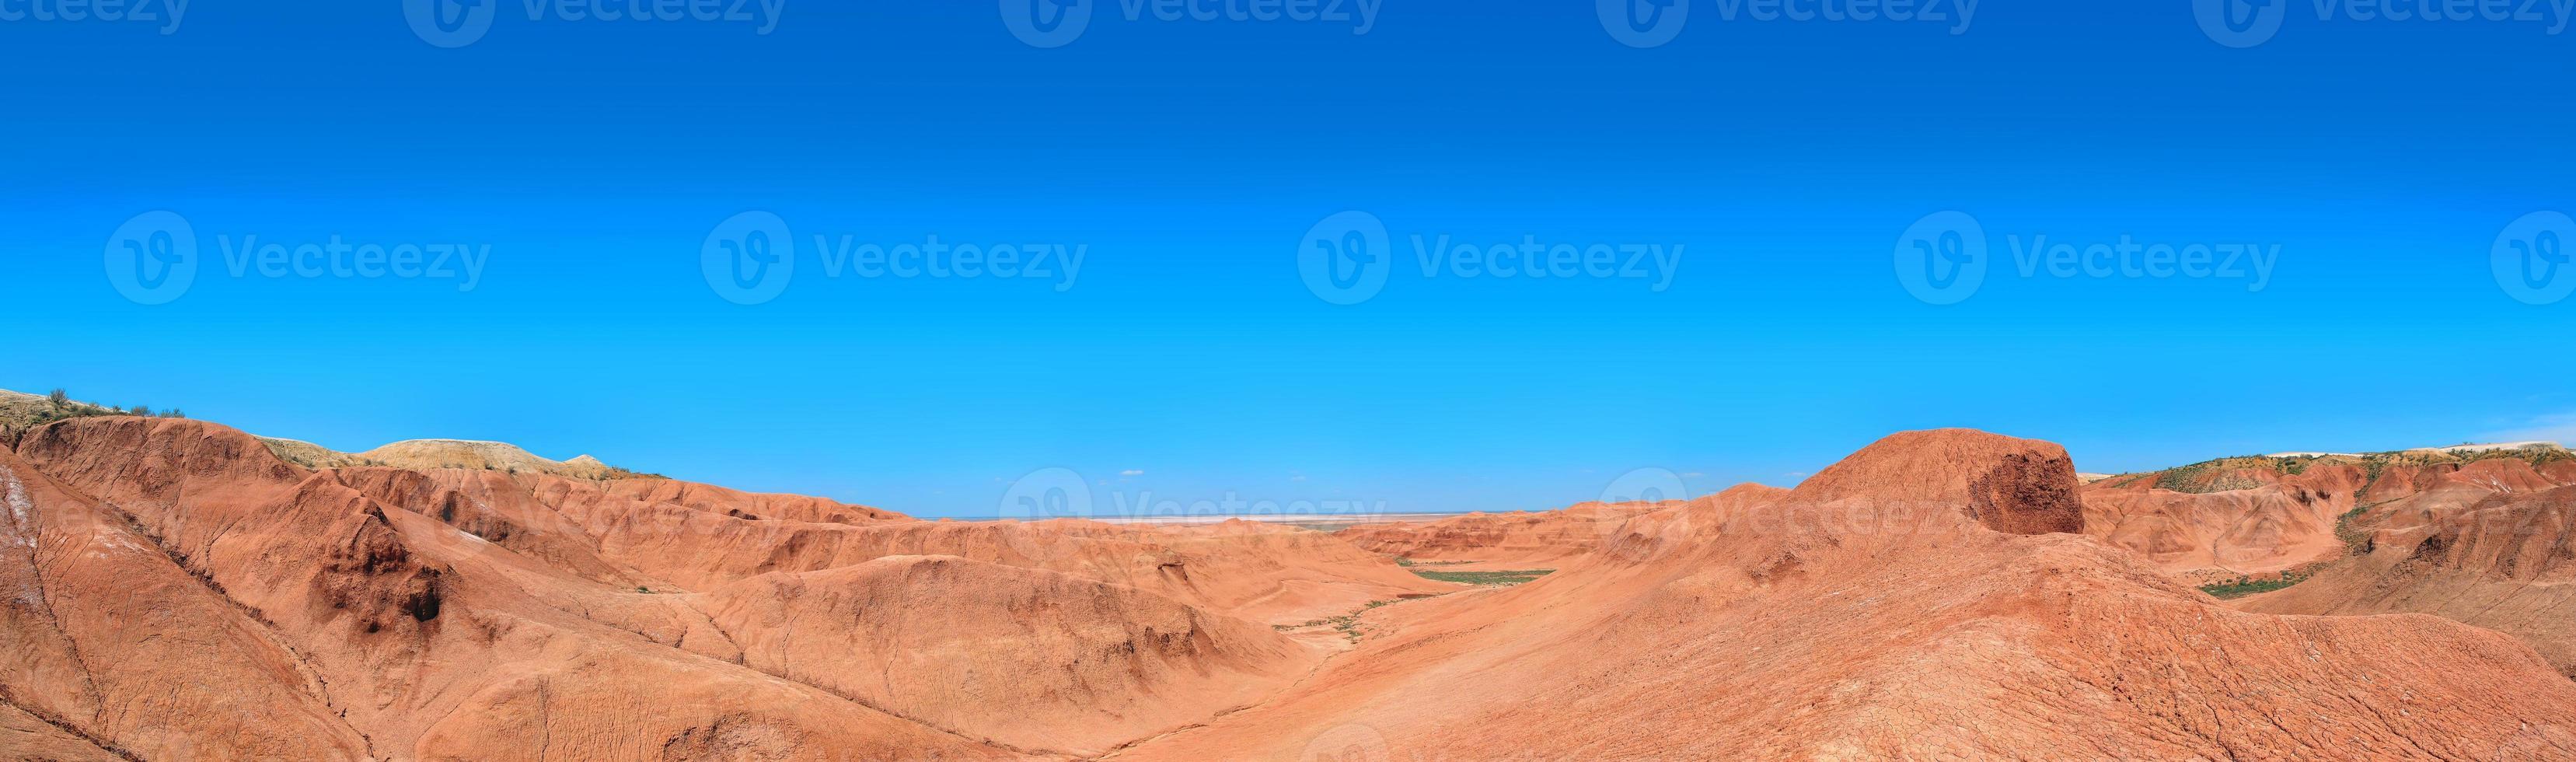 Argillaceous desert photo